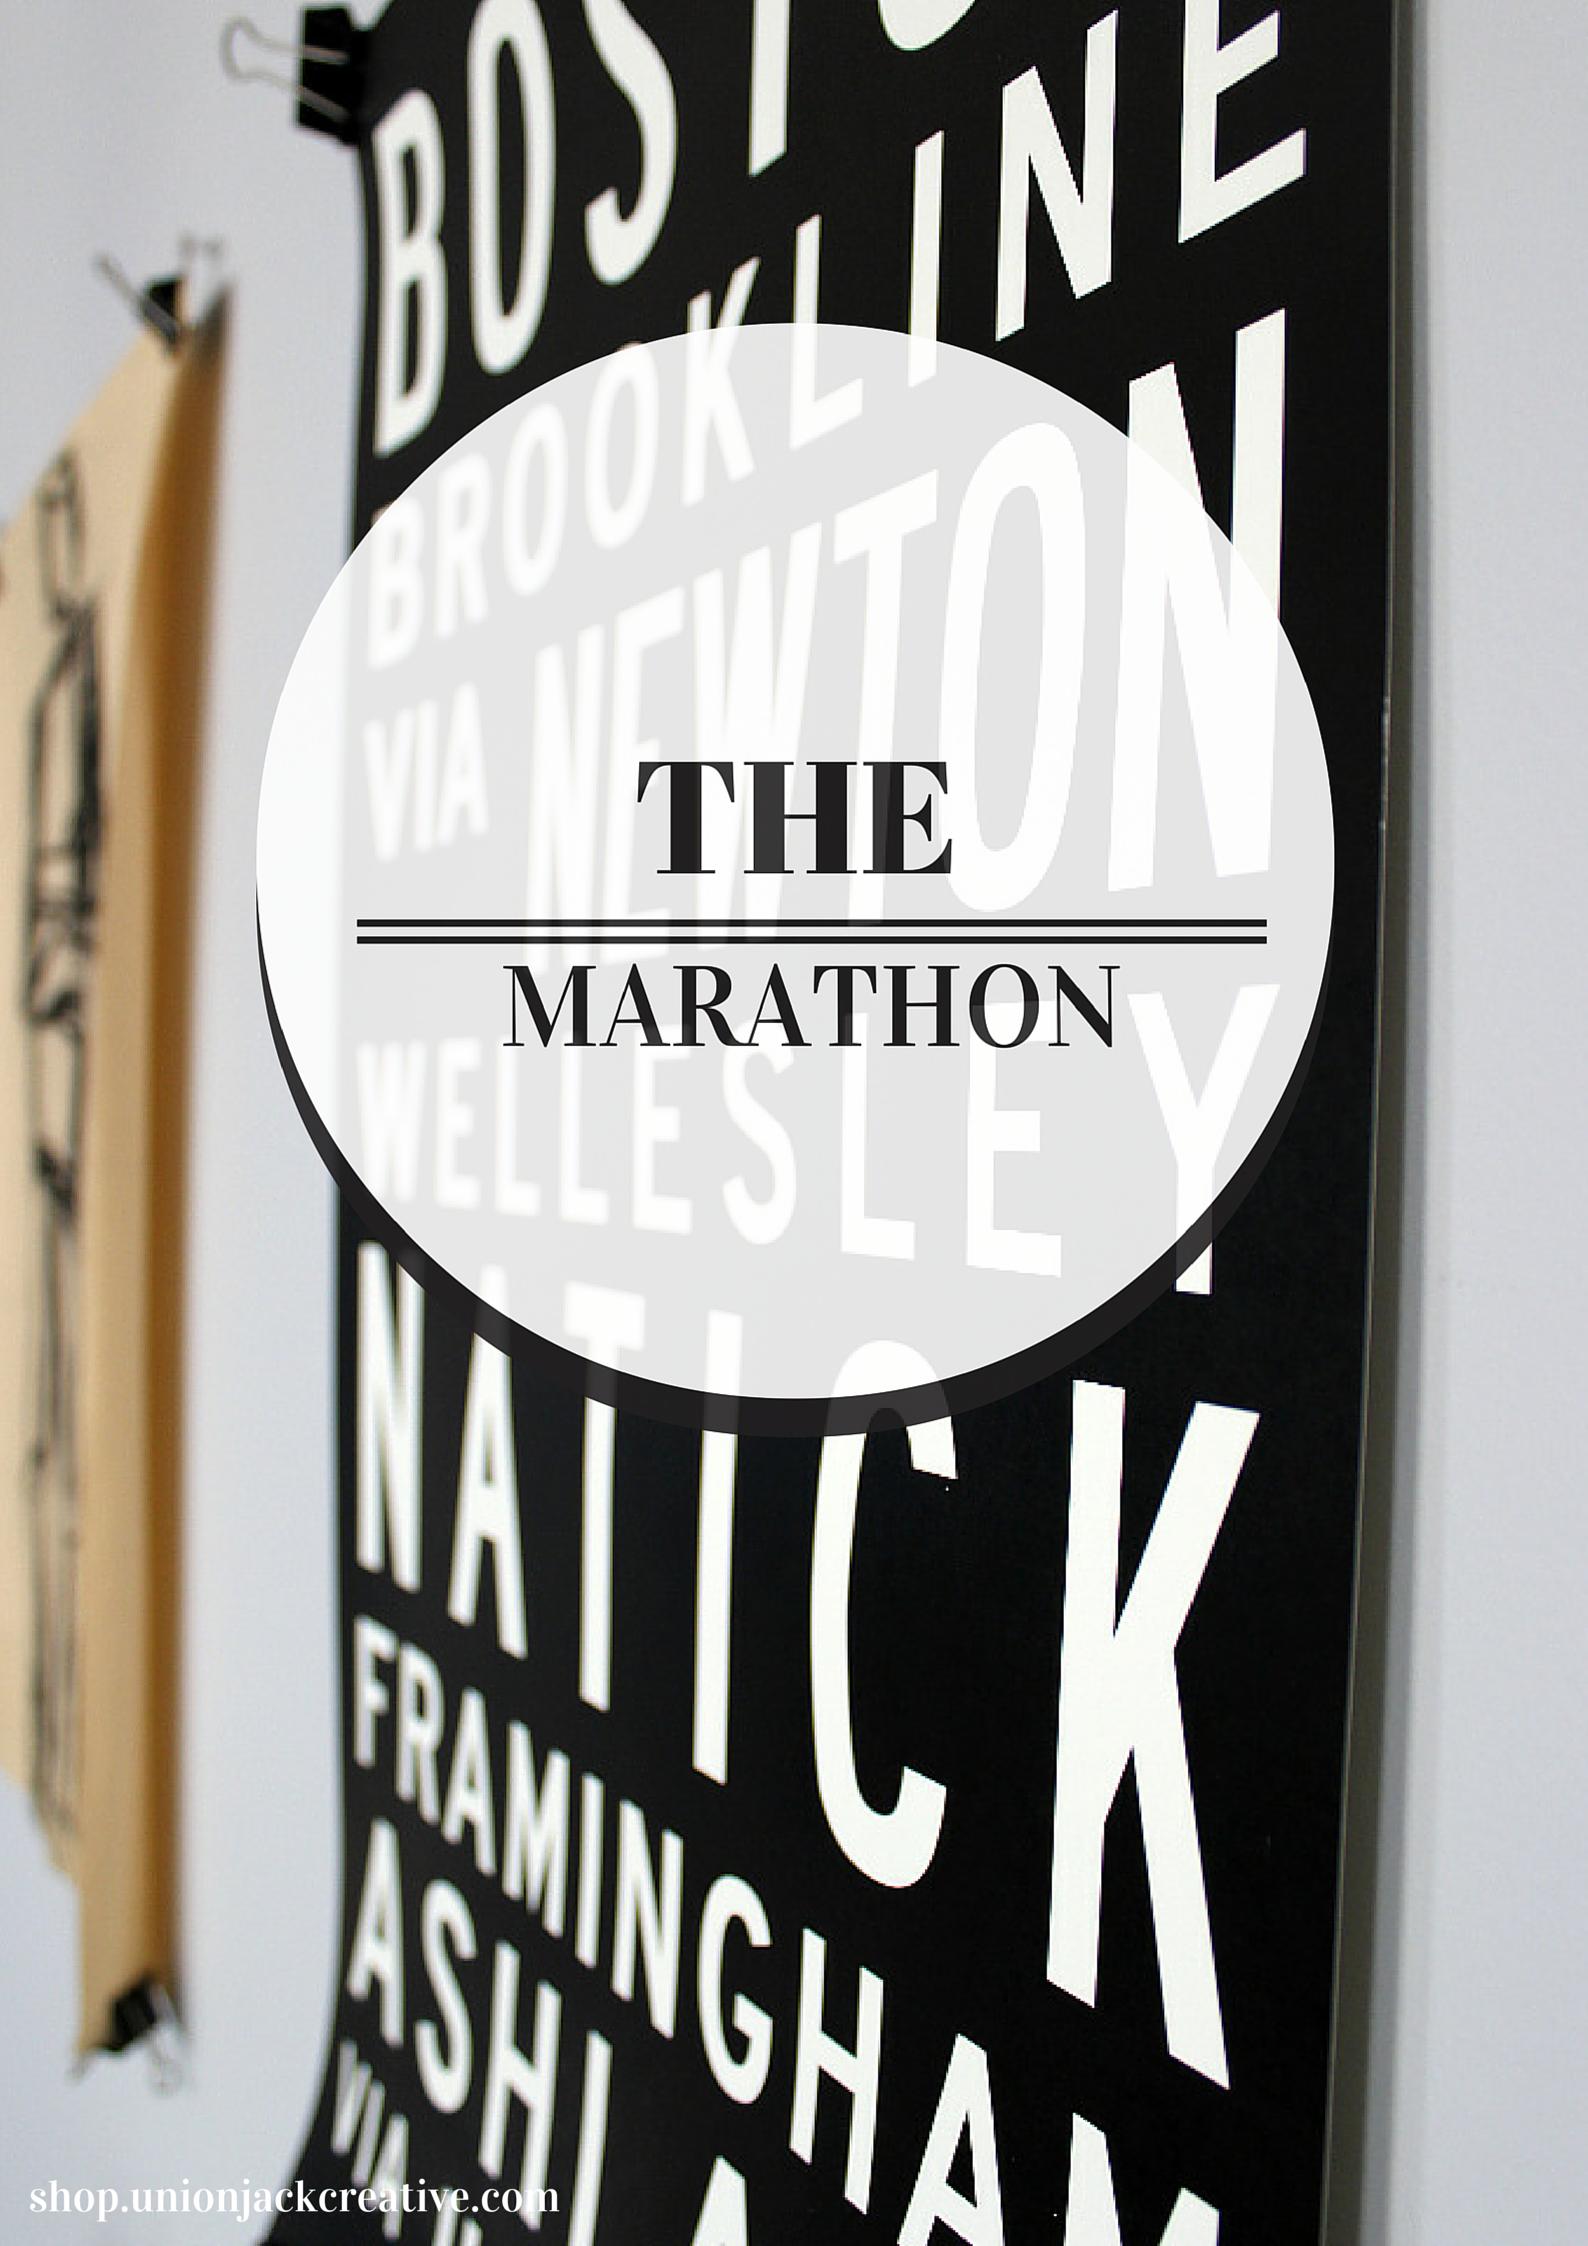 #boston #marathon #poster // union jack creative http://shop.unionjackcreative.com  #bostonmarathon #hopkinton #black #white #train #bus #helvetica #design #type #print